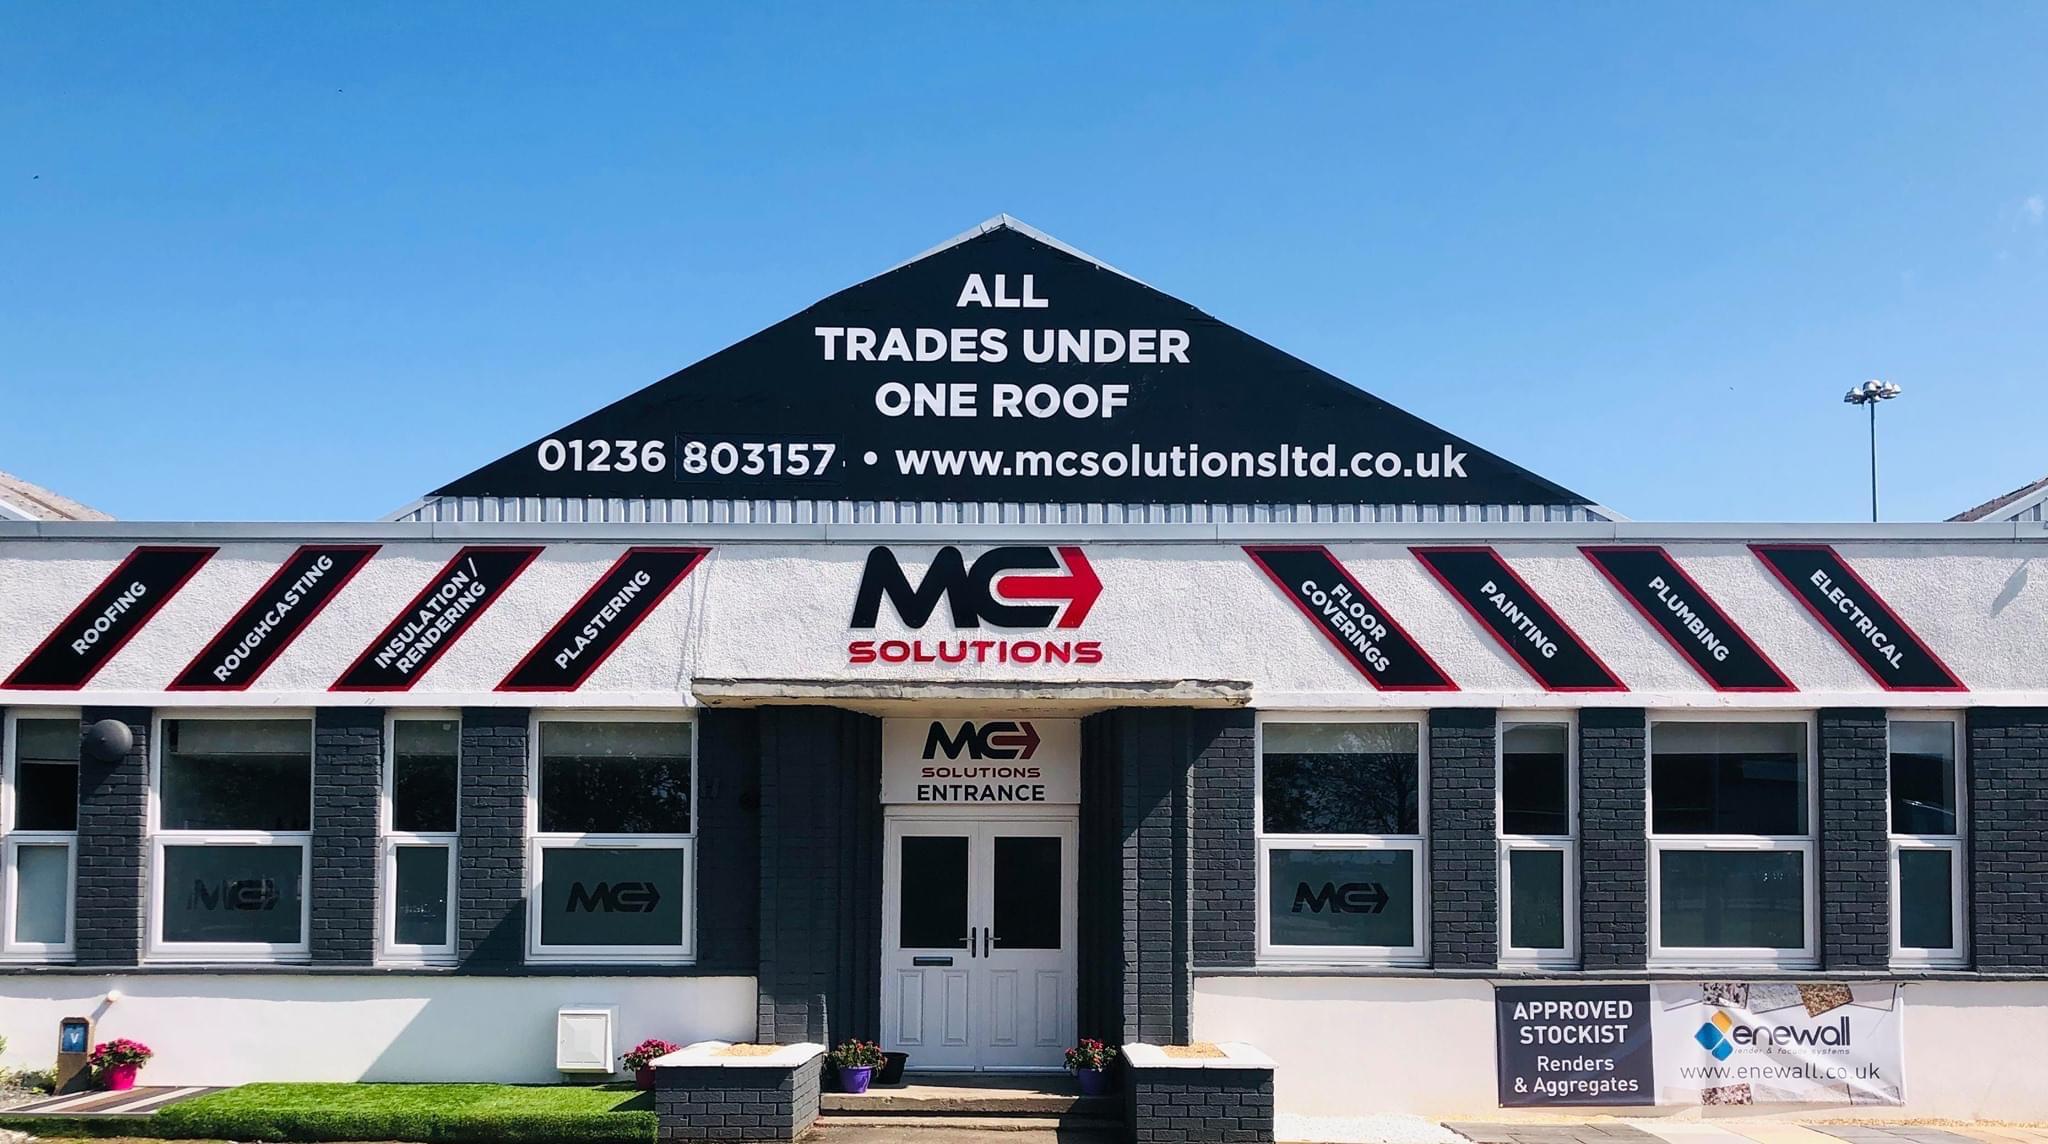 mc-solutions-roughcasters-edinburgh